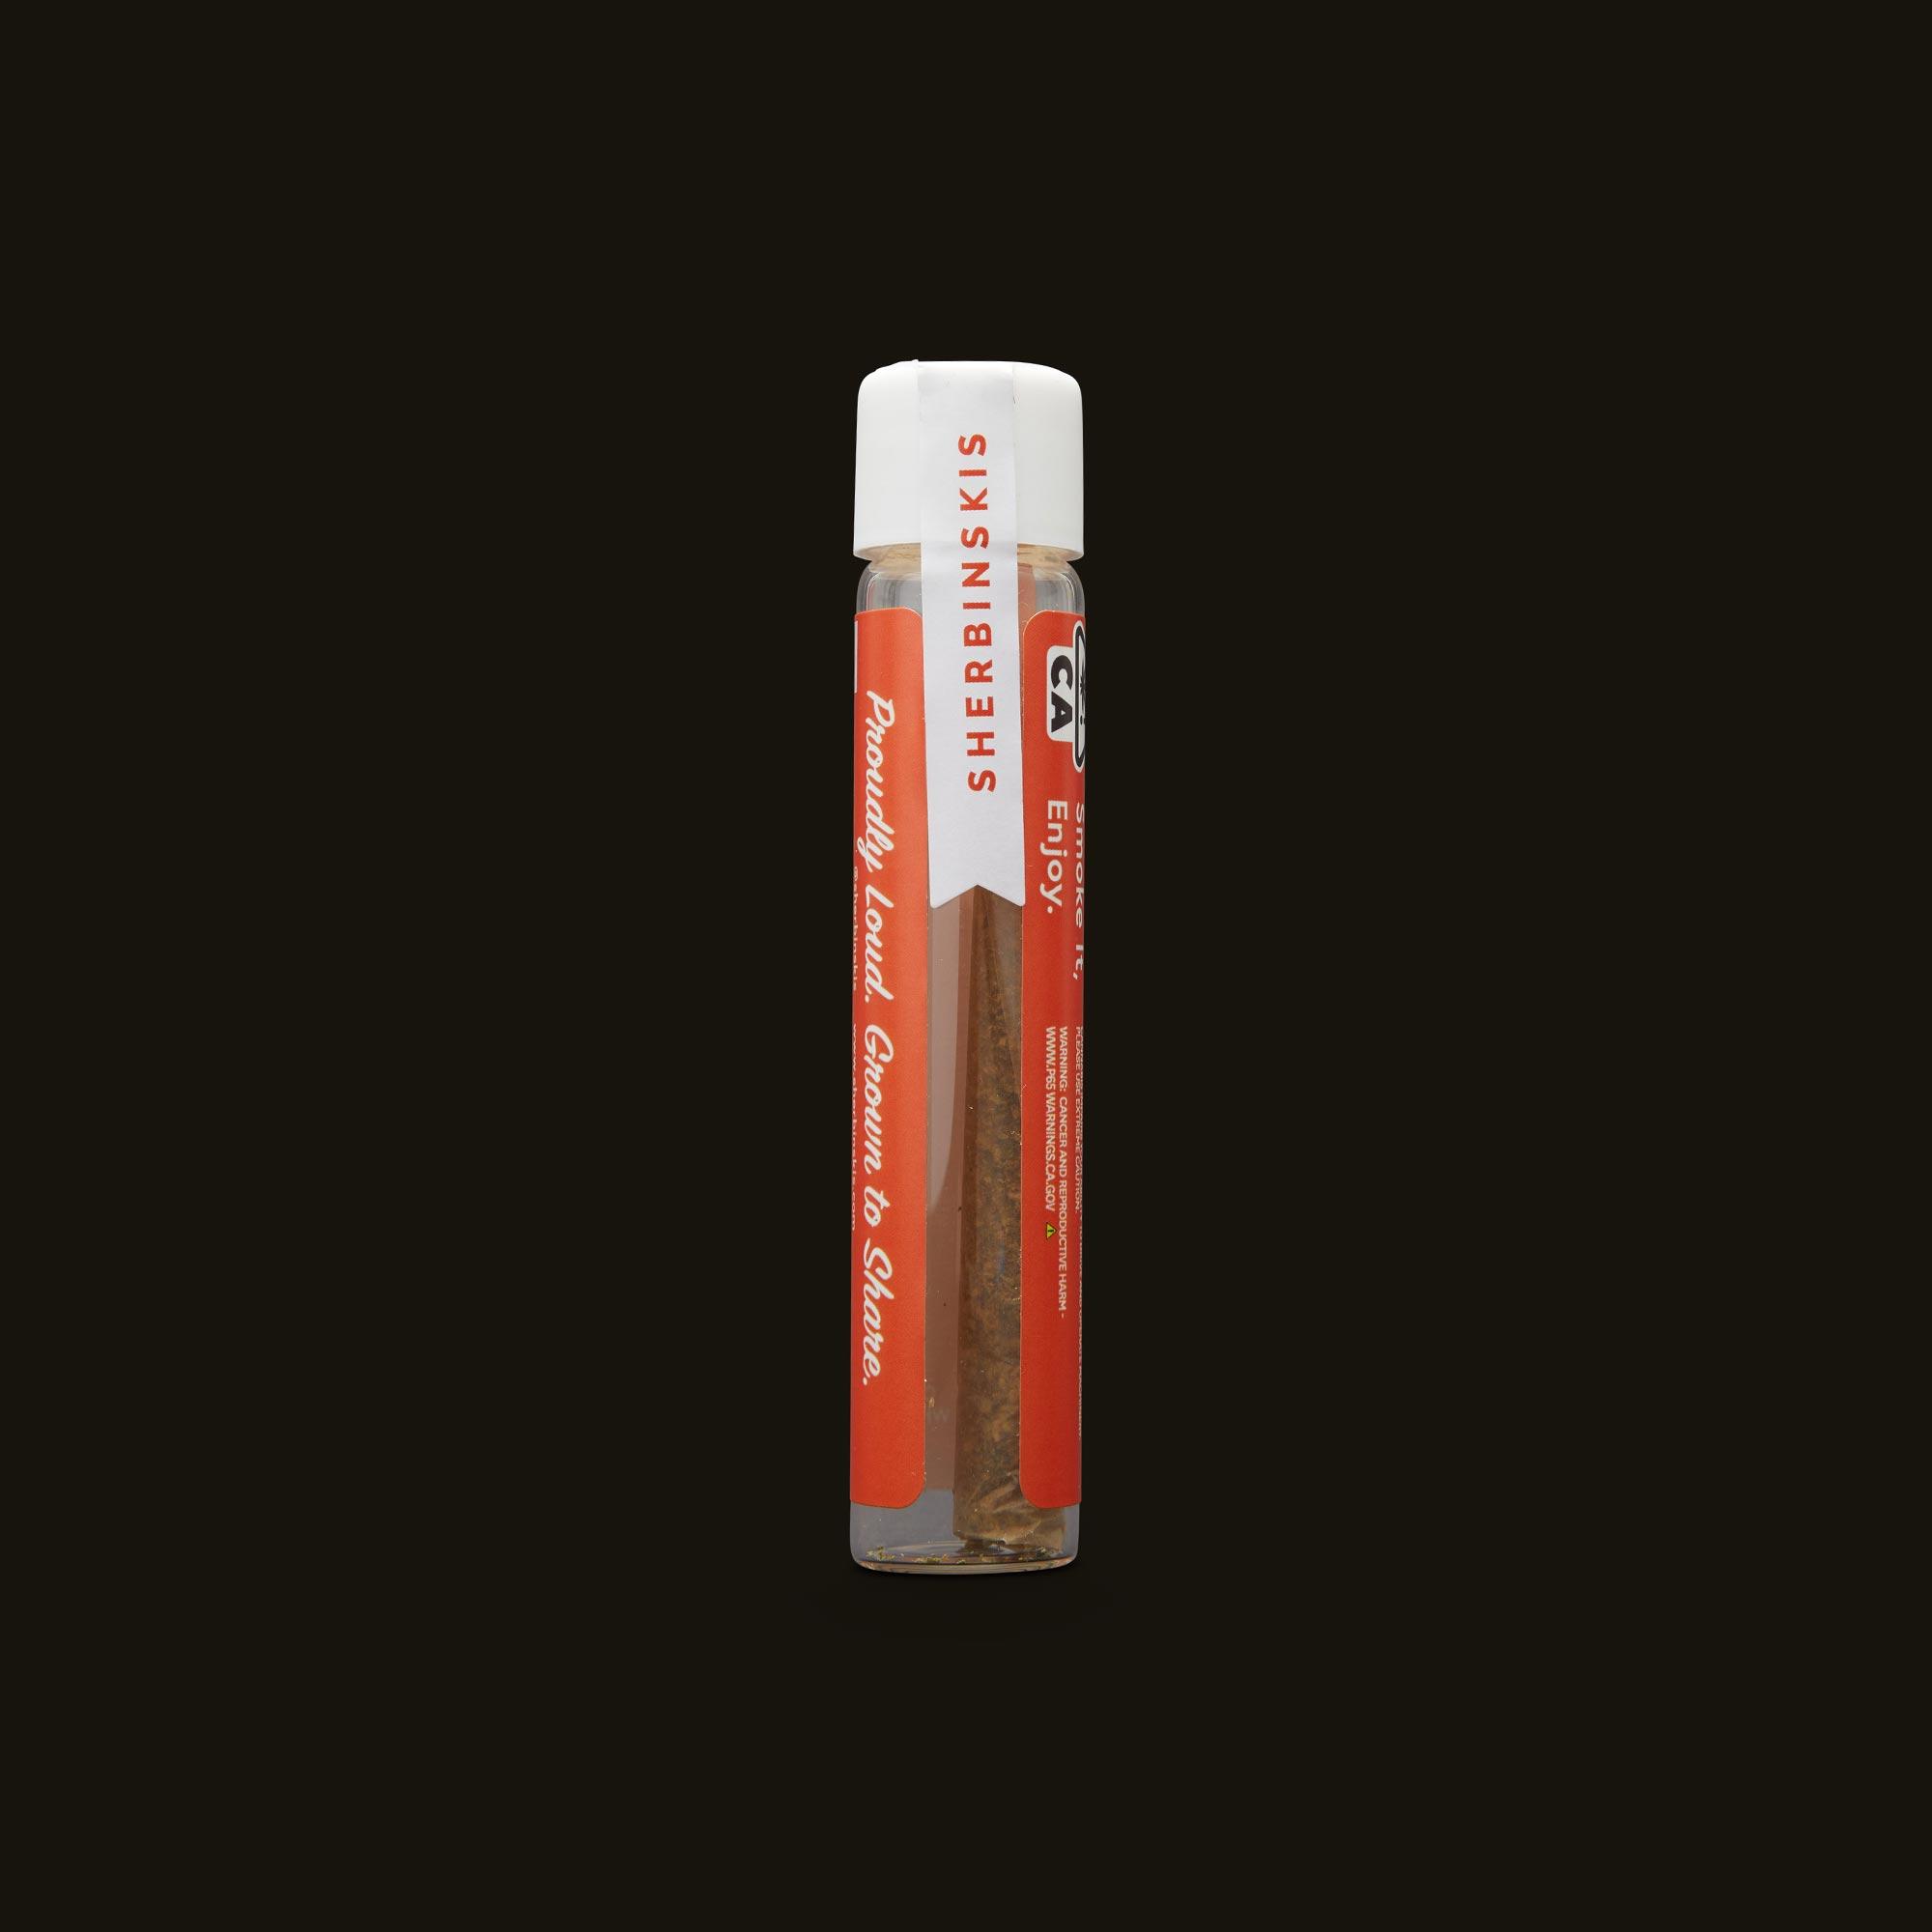 Sherbinskis Acaiberry Gelato Pre-Roll Side Packaging